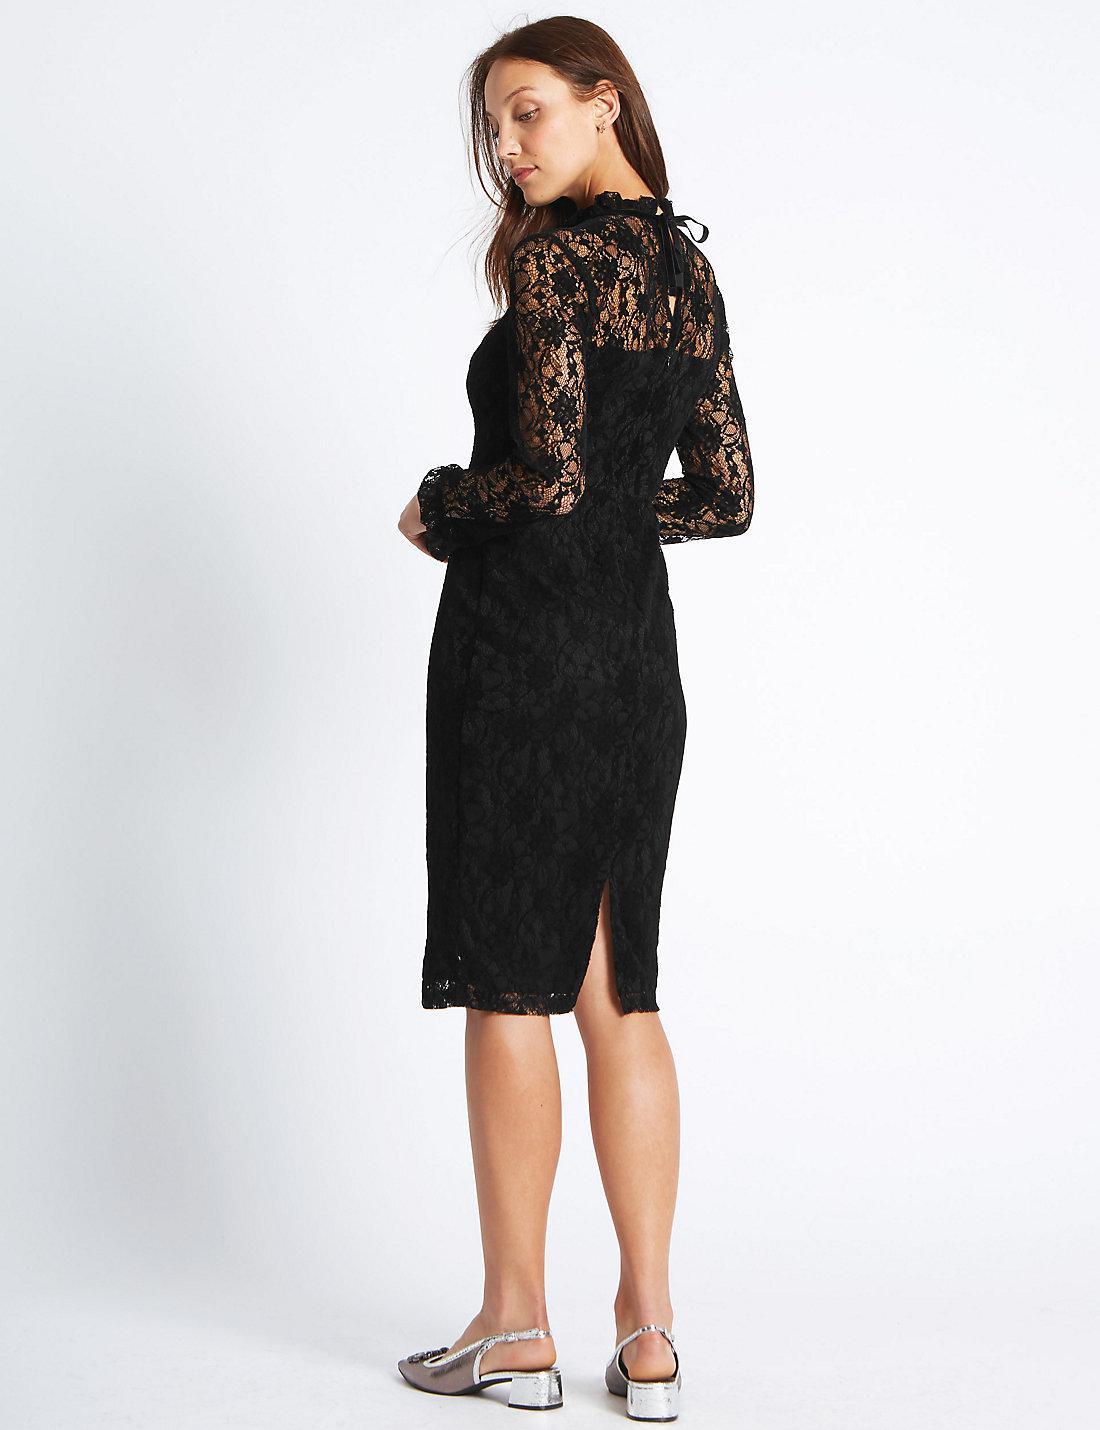 f8a5b71f77c Floral Lace Long Sleeve Bodycon Midi Dress - Data Dynamic AG